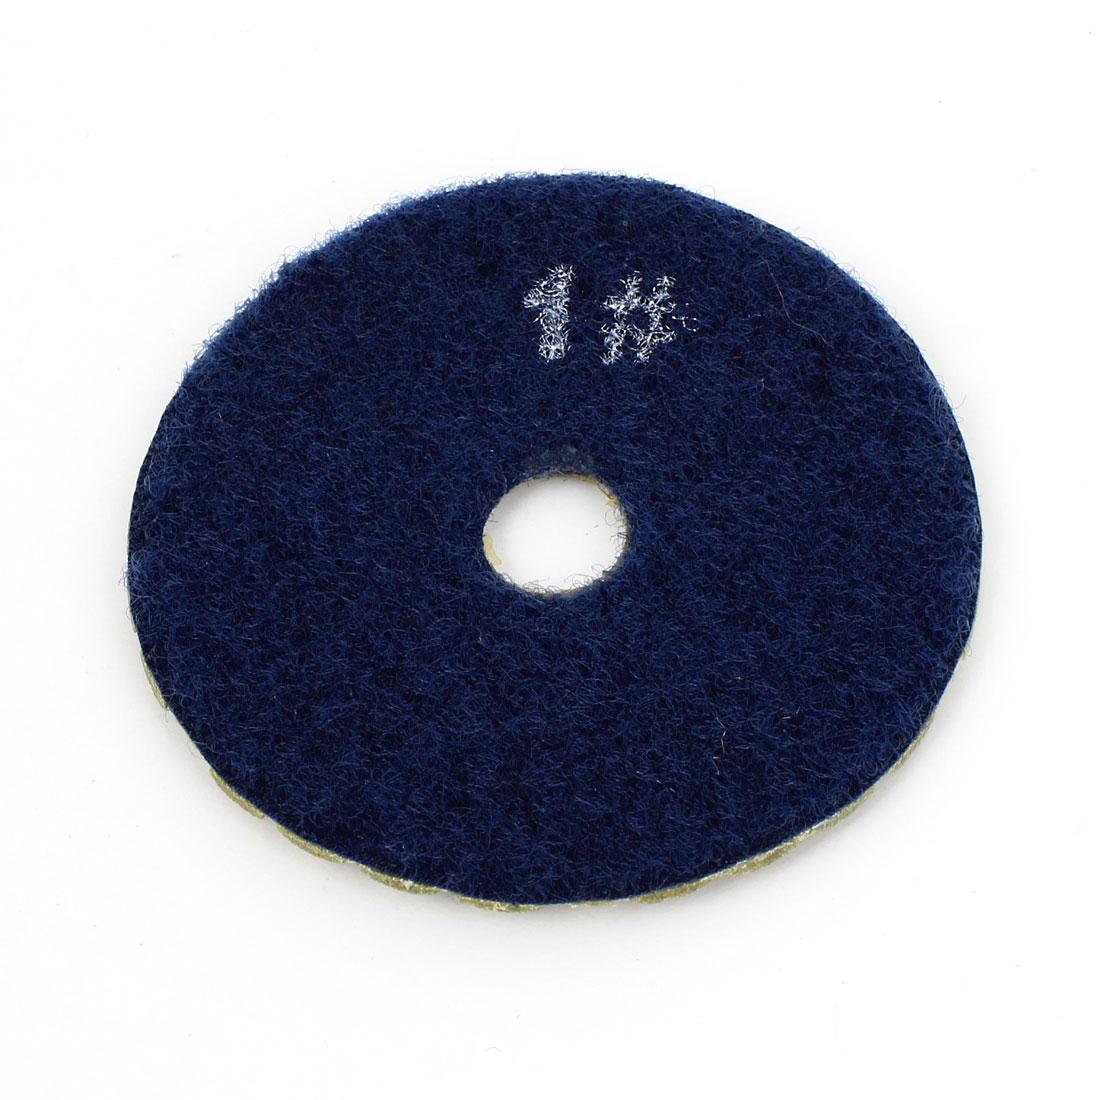 "3"" Diameter 4mm Thickness 50 Grit Diamond Dry Polishing Pad Khaki Blue"